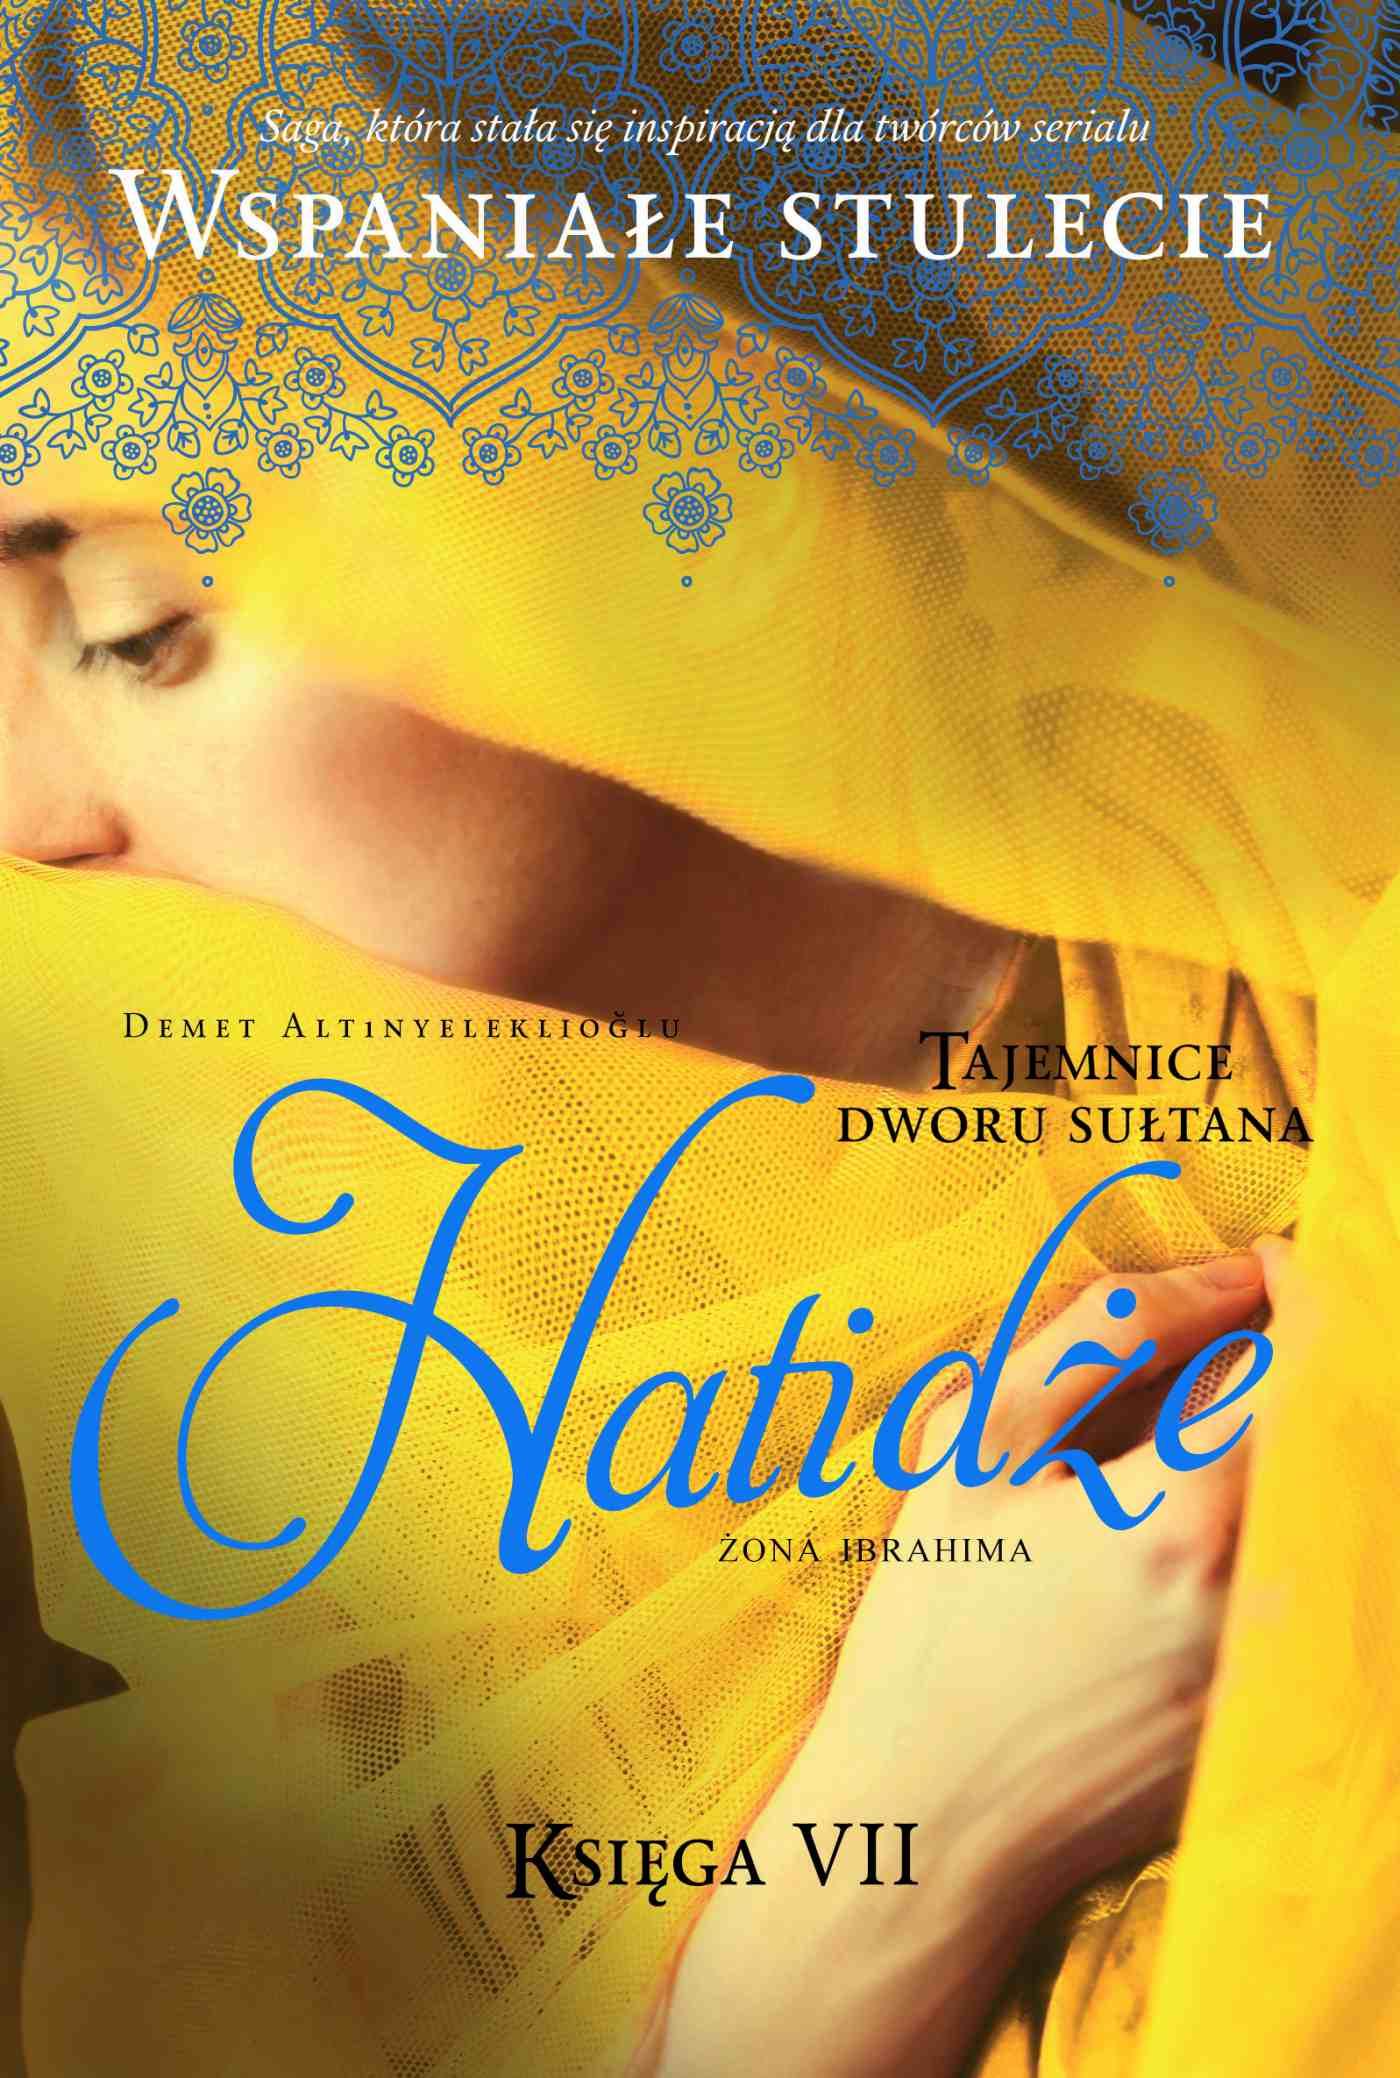 Tajemnice dworu sułtana. Hatidże. Księga 7 - Ebook (Książka na Kindle) do pobrania w formacie MOBI